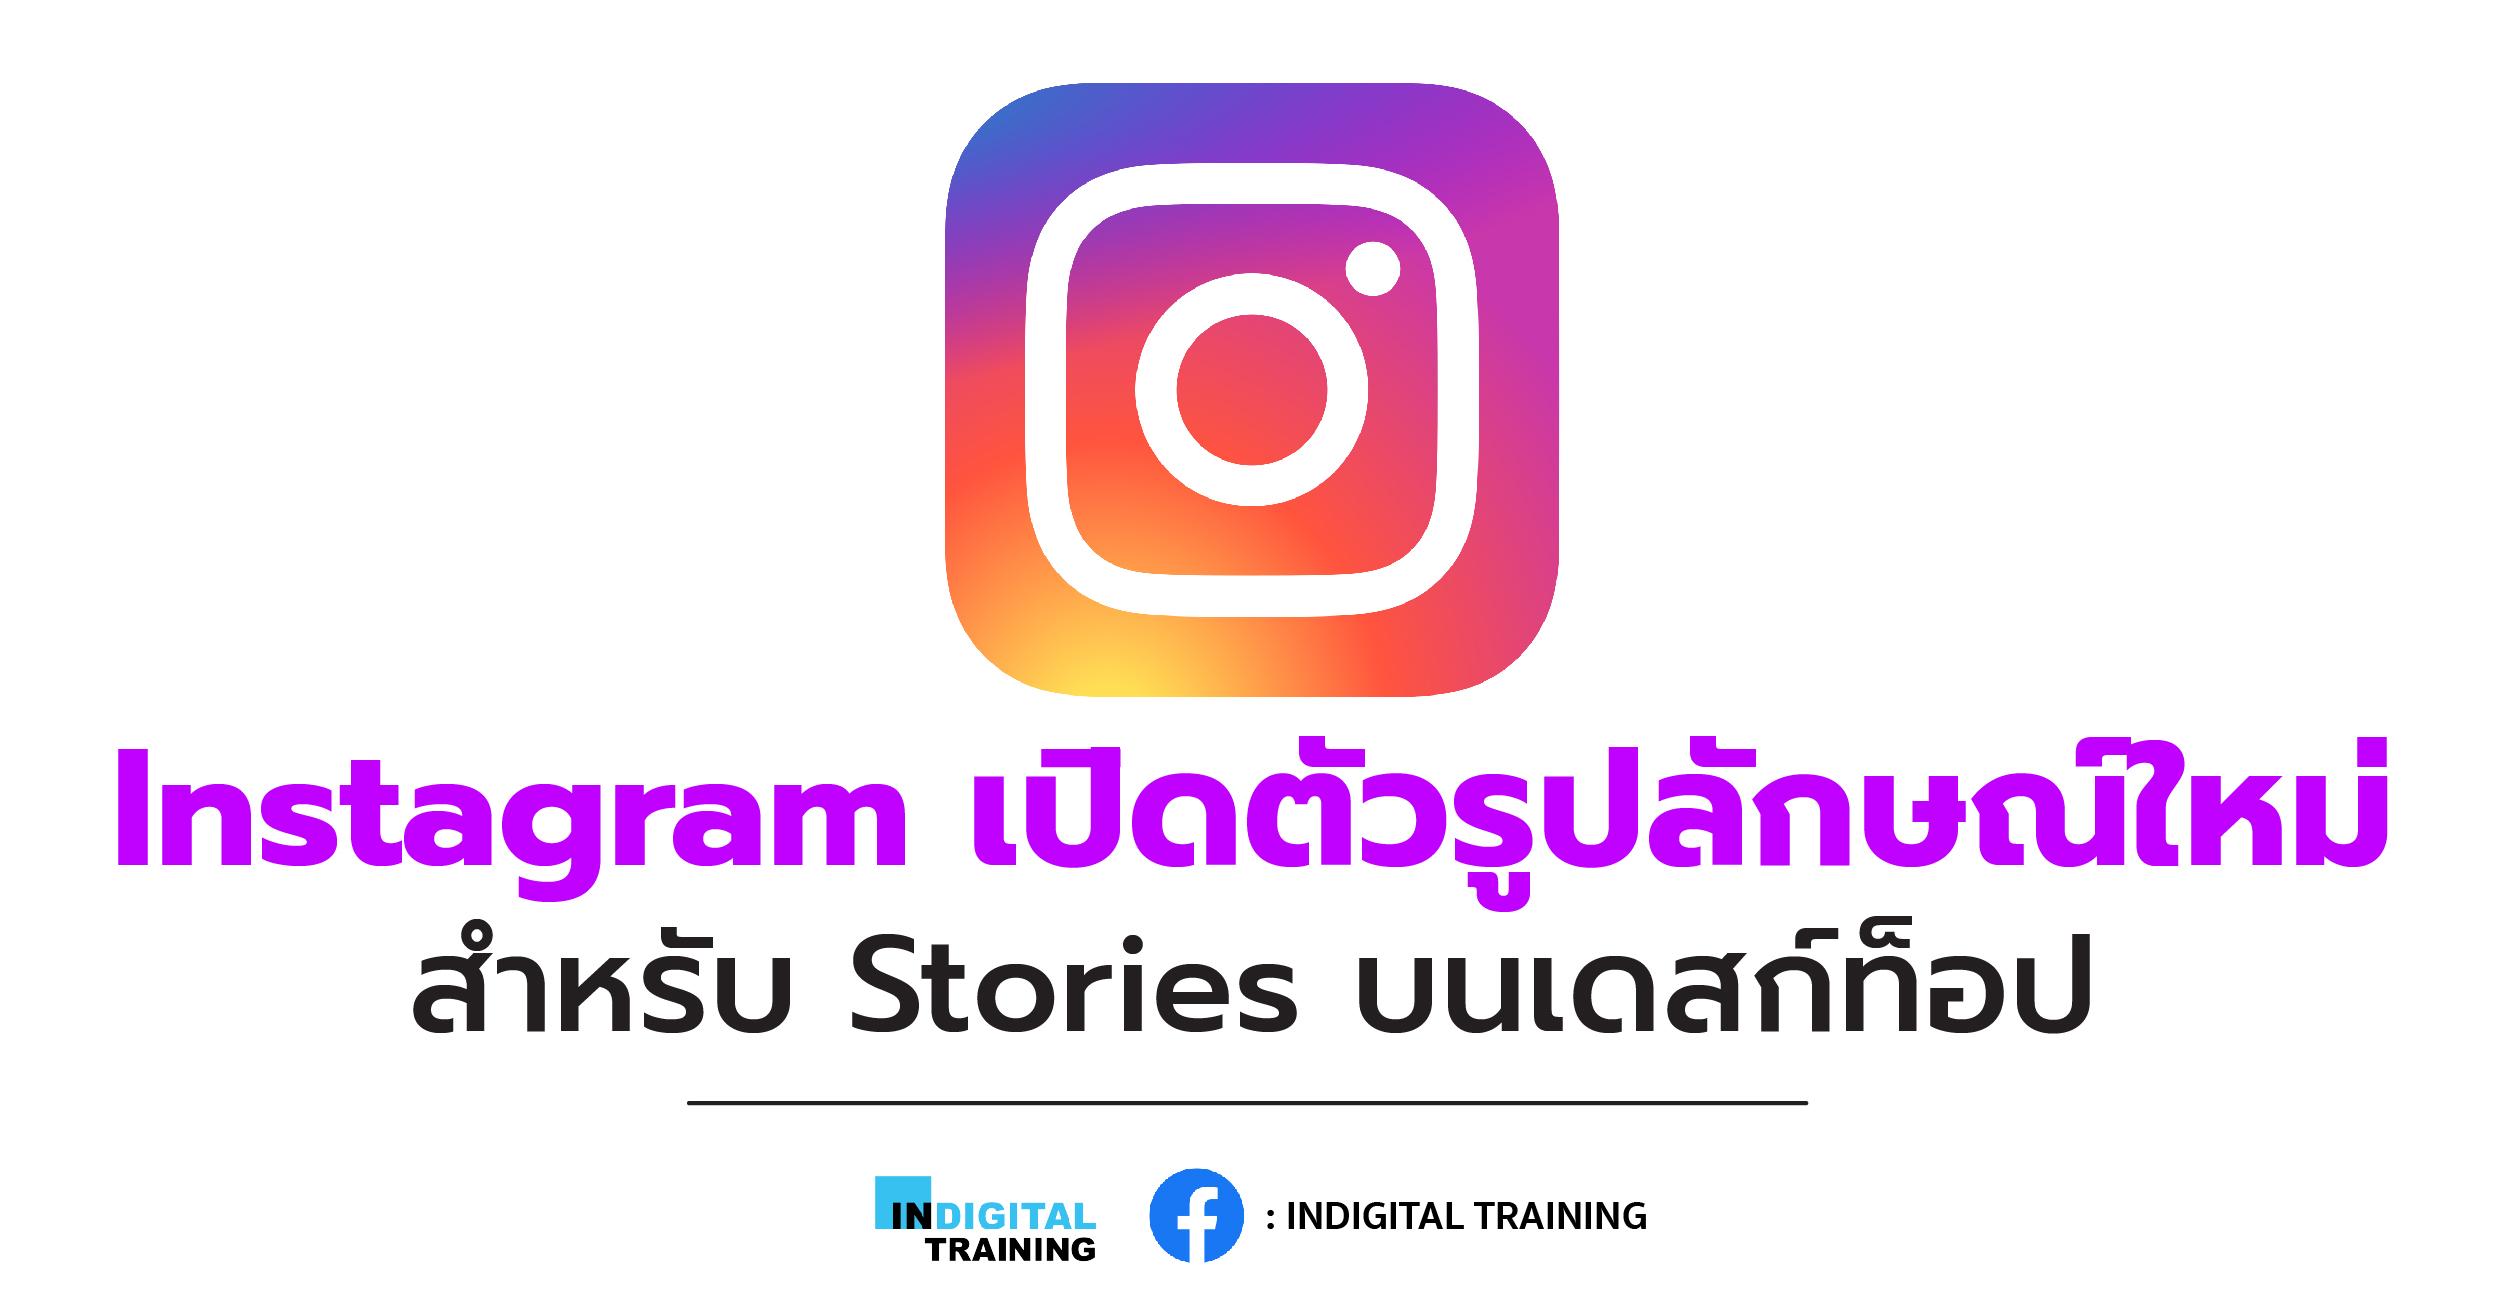 Instagram เปิดตัวรูปลักษณ์ใหม่สำหรับ Stories บนเดสก์ท็อป